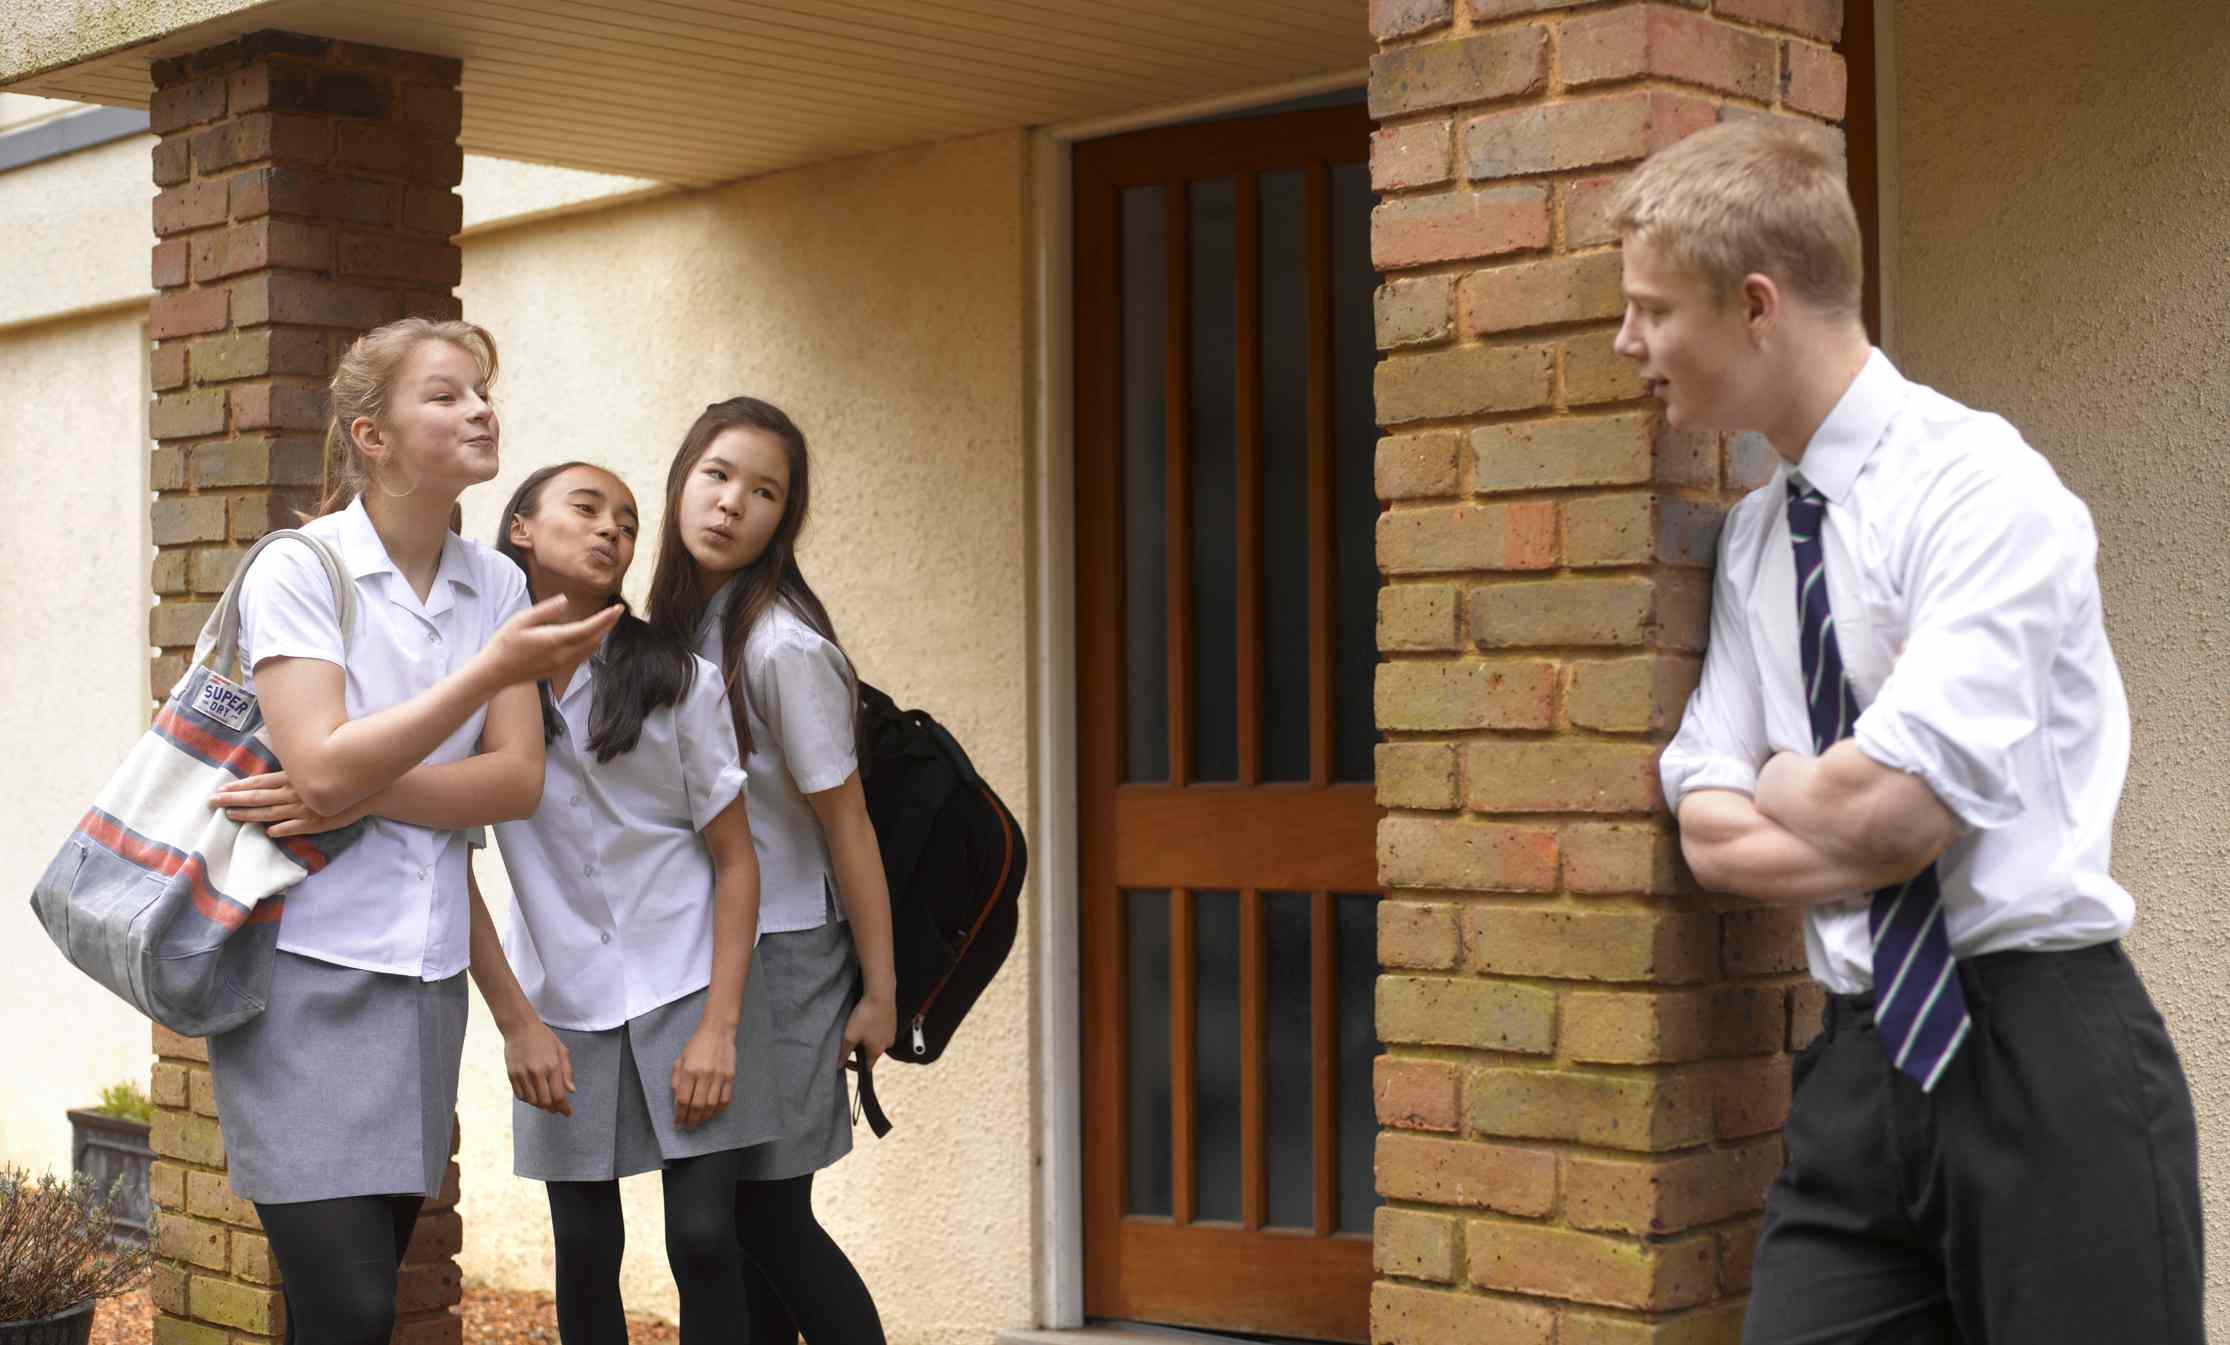 School girls blowing kisses to school boy